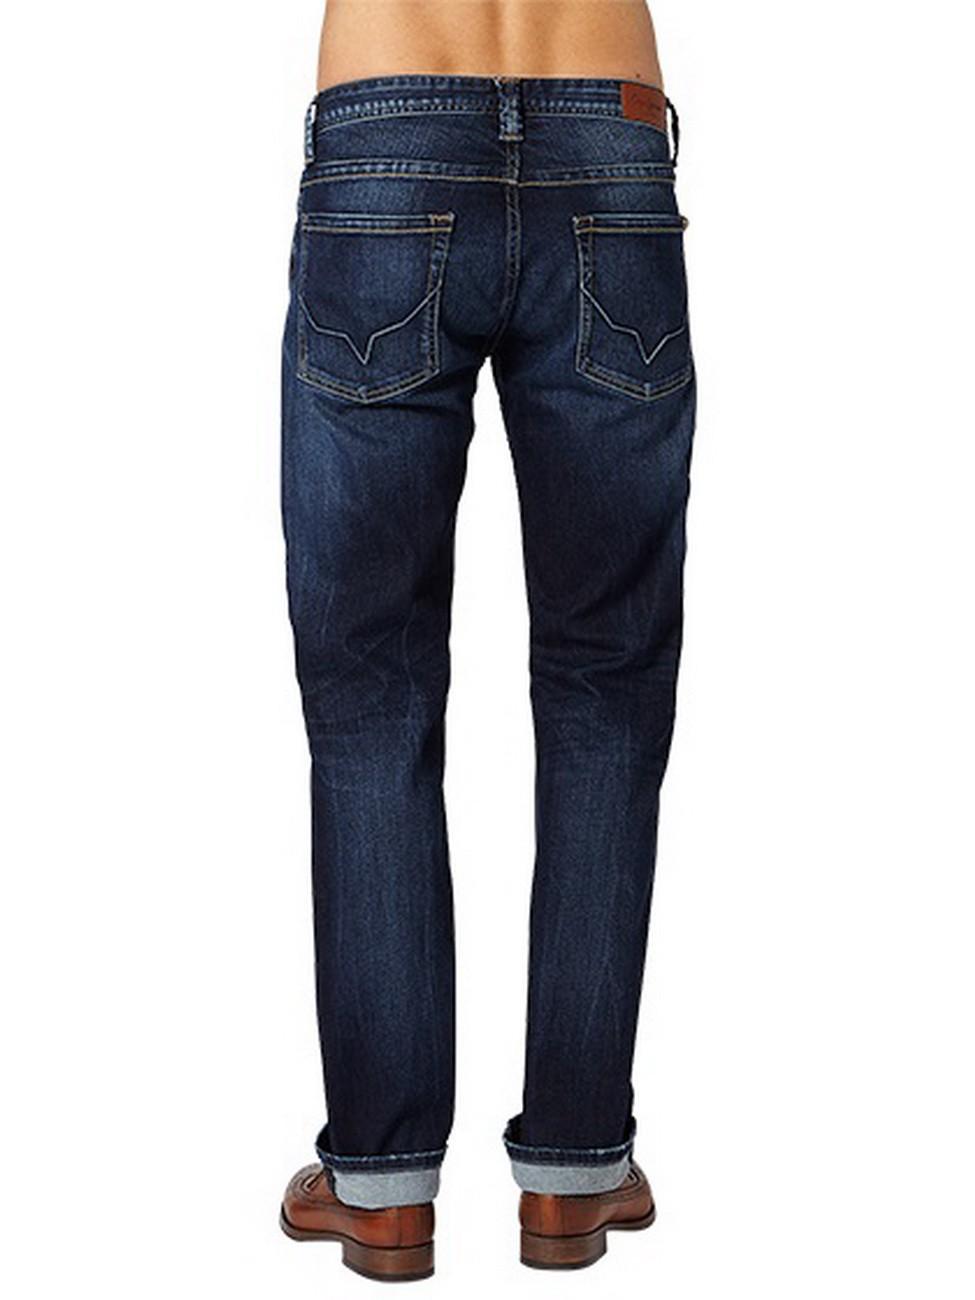 pepe jeans herren jeans pm200143z45 kingston zip regular fit dark blue ebay. Black Bedroom Furniture Sets. Home Design Ideas